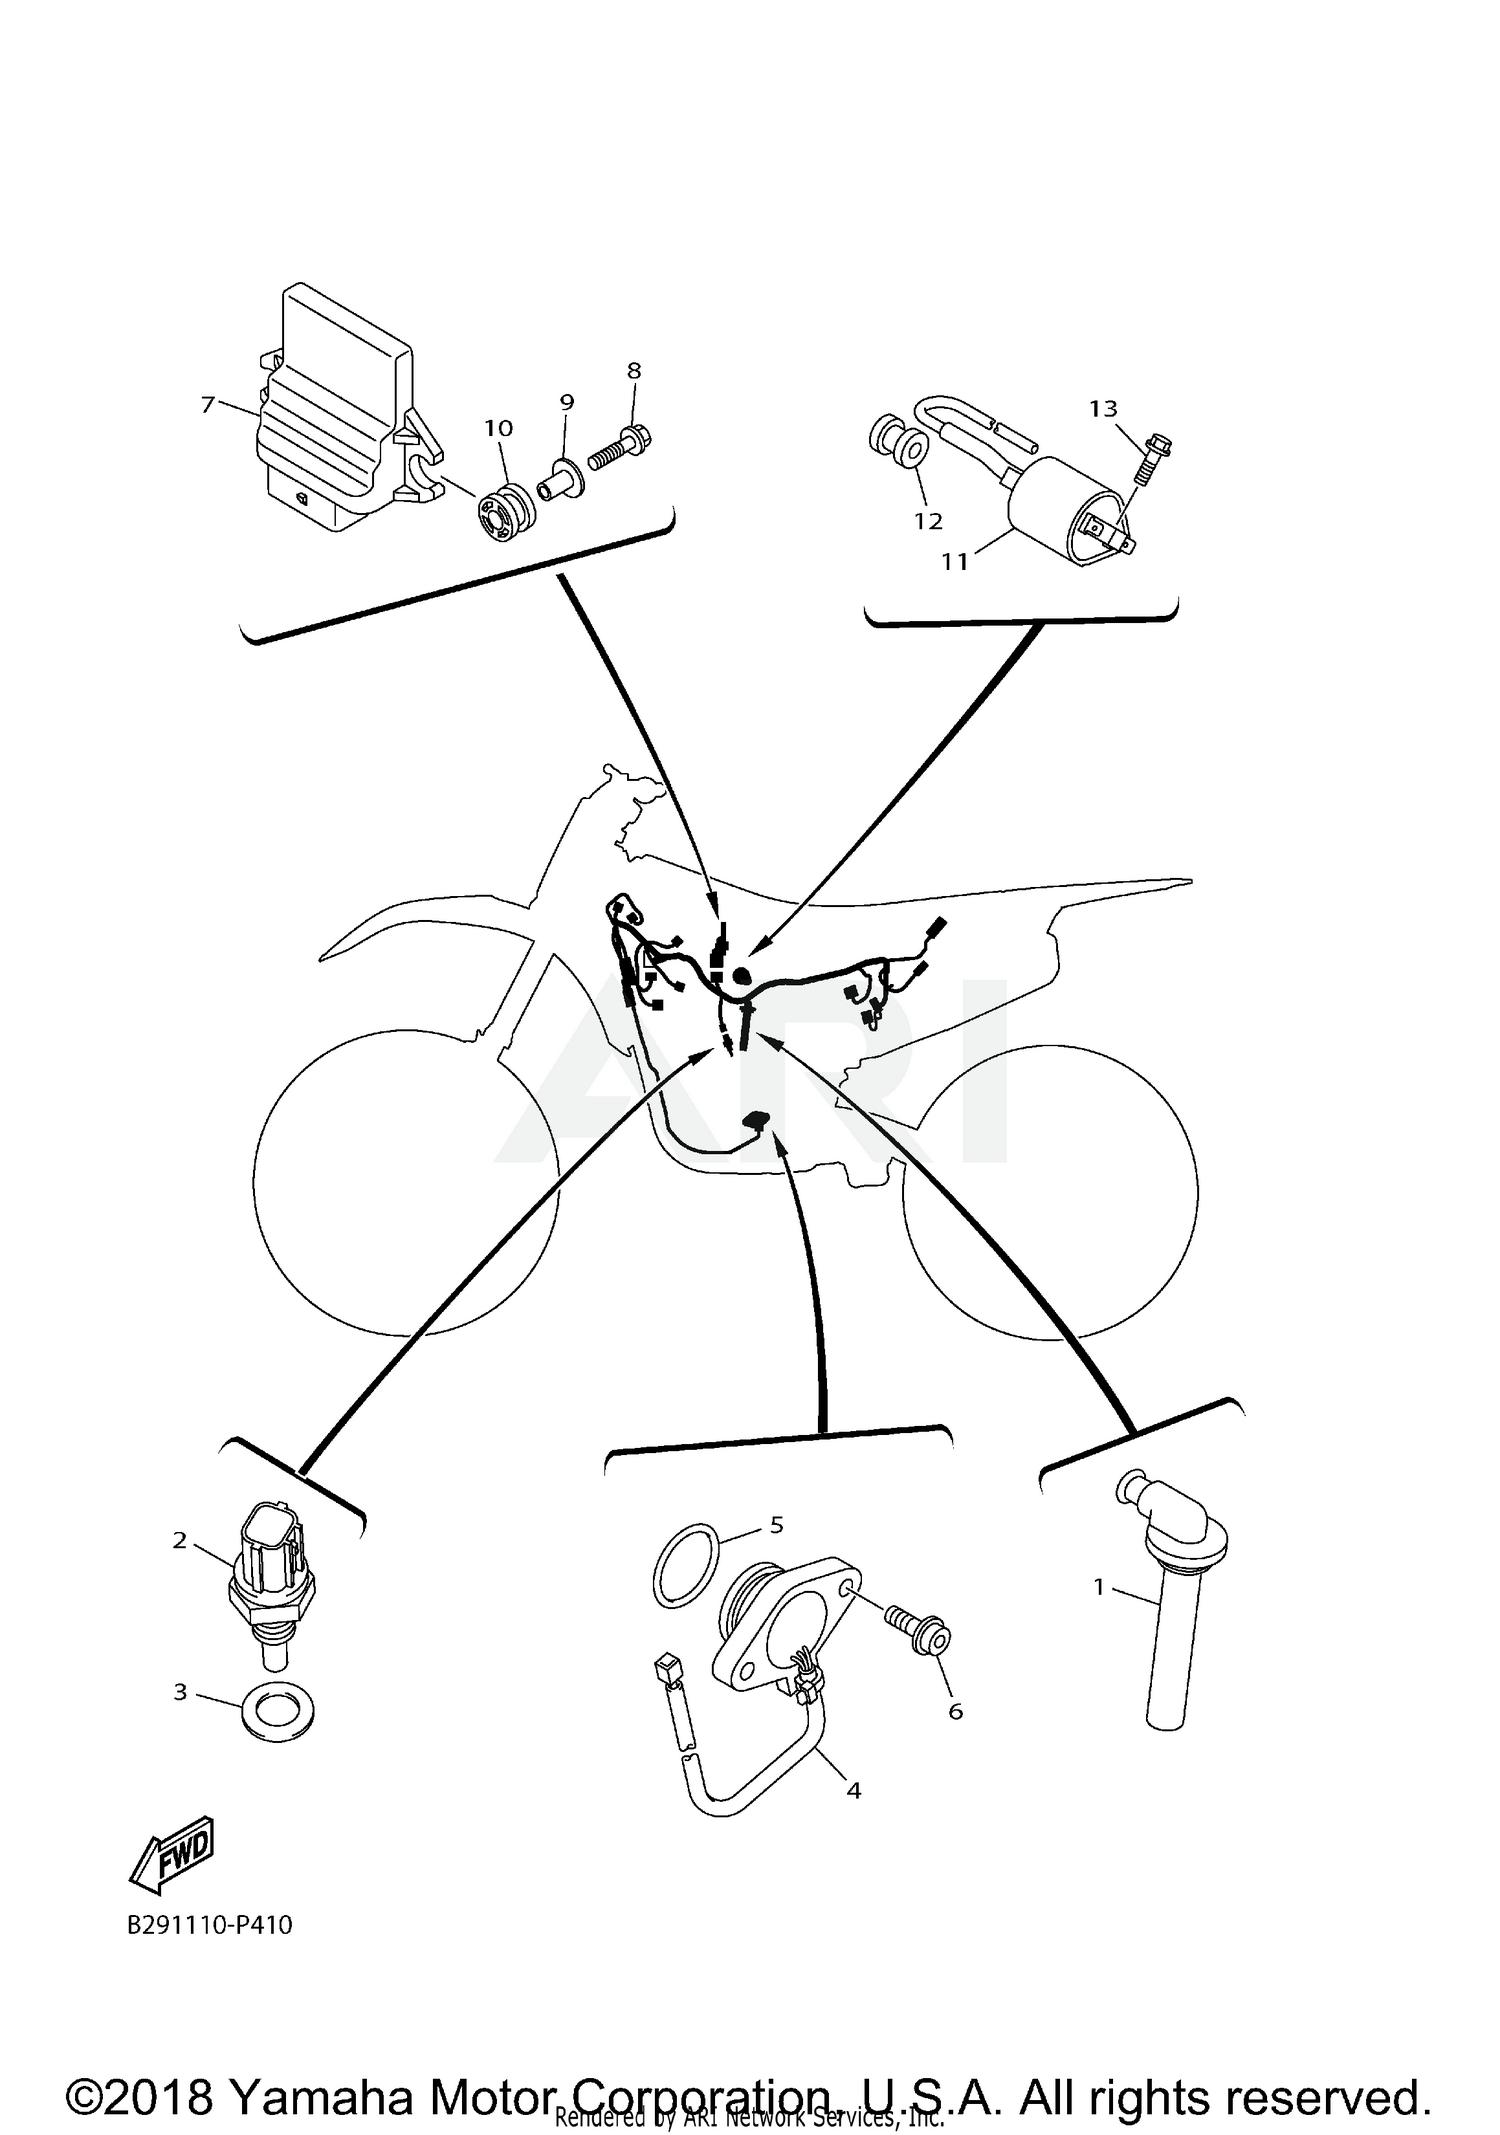 2018 Yamaha WR450F - WR450FJ ELECTRICAL 1 Parts & OEM Diagram for  Motorcycles | Wr450f Wiring Diagram |  | Bike Bandit